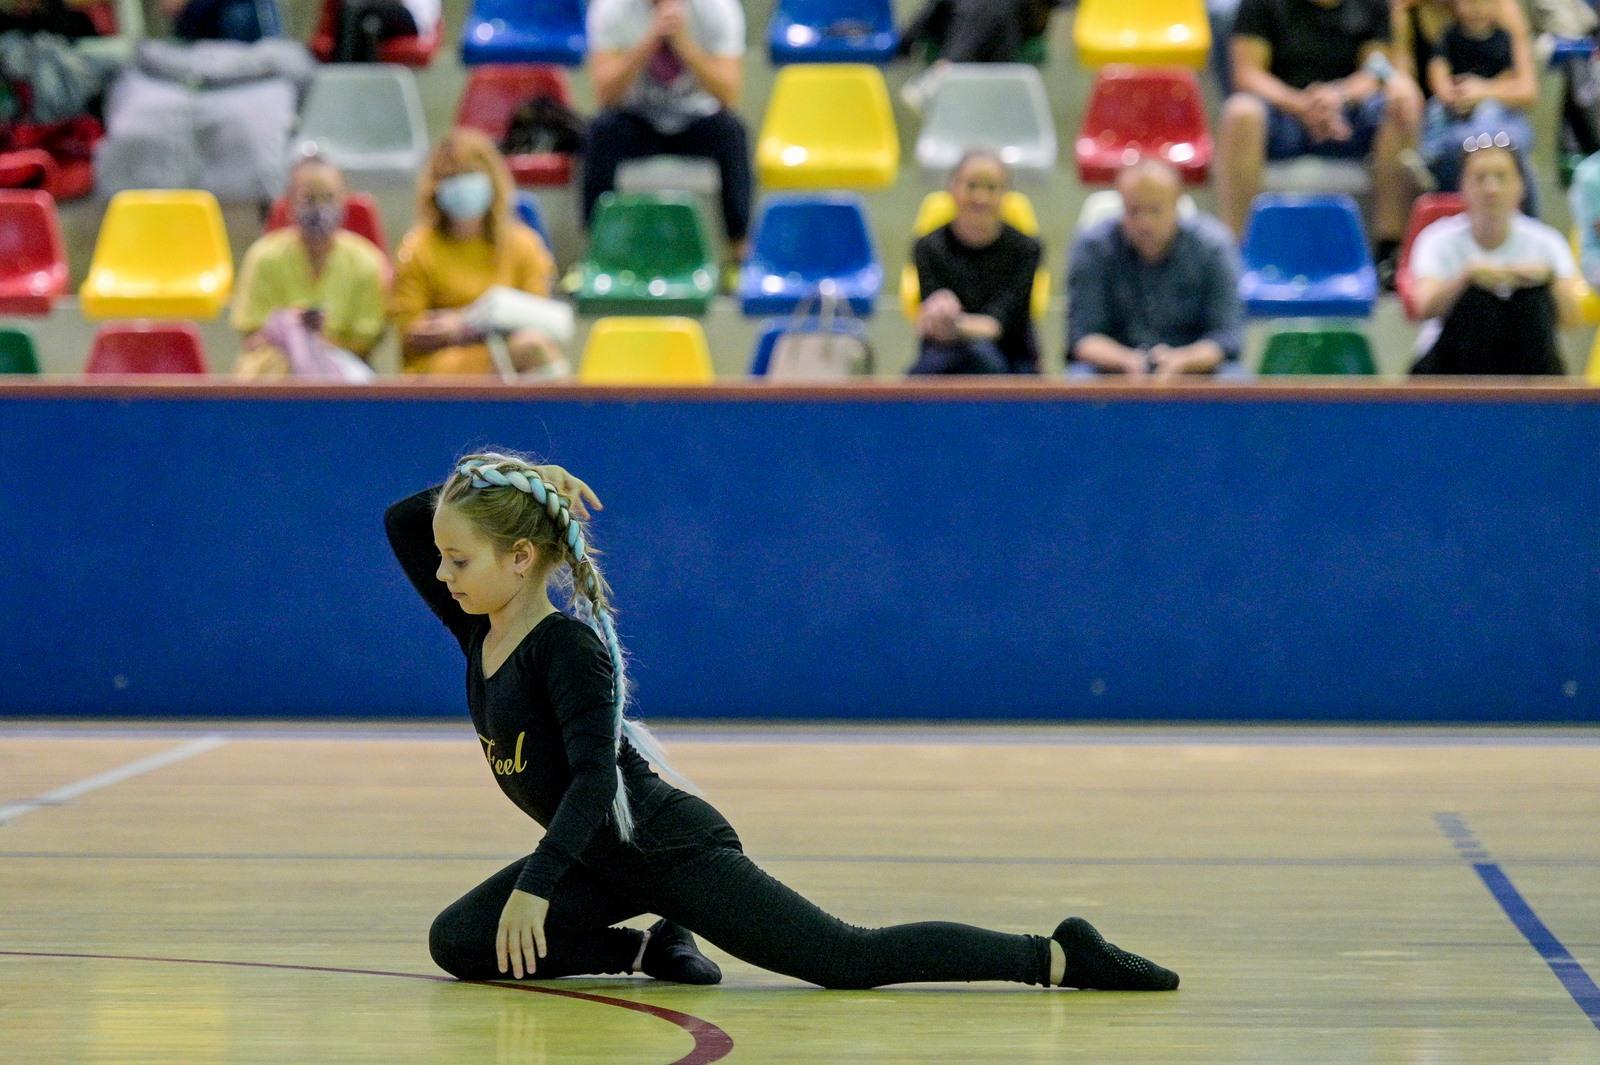 EU_tjedan_sporta_ples (26)